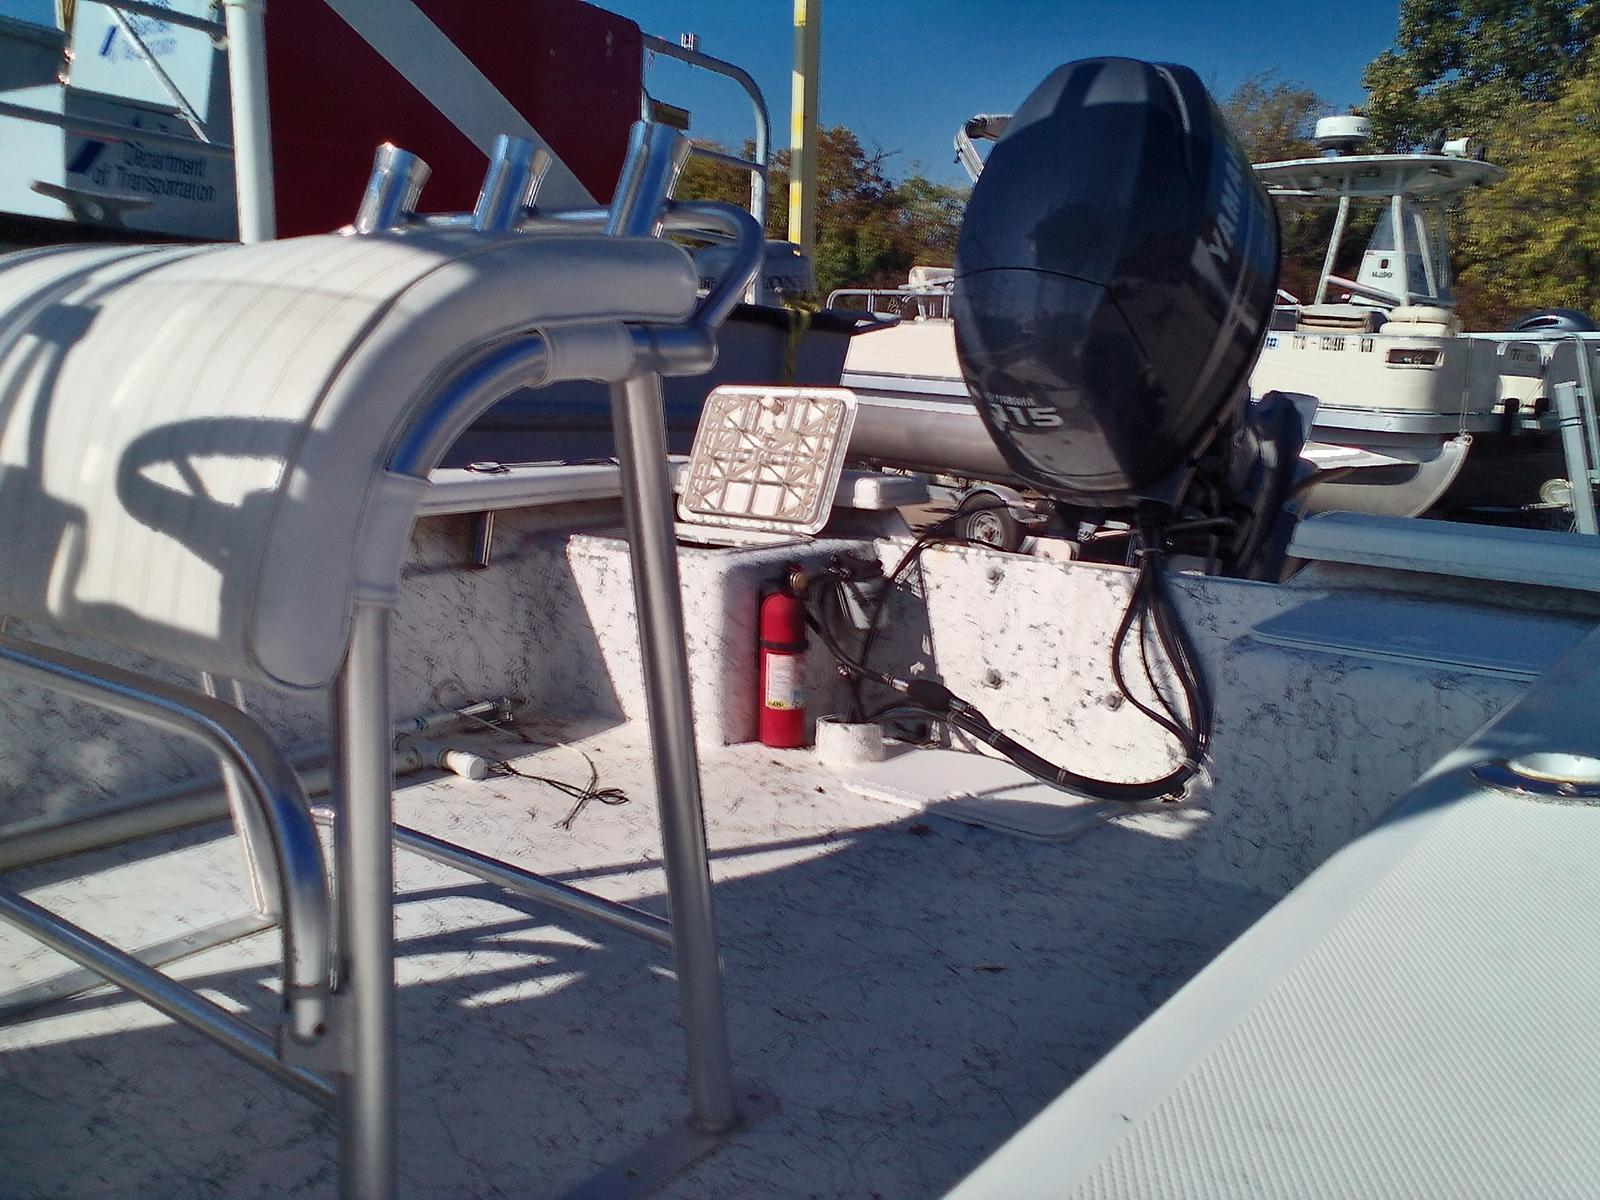 2008 Riddick boat for sale, model of the boat is Bay Runner 2290 & Image # 6 of 6